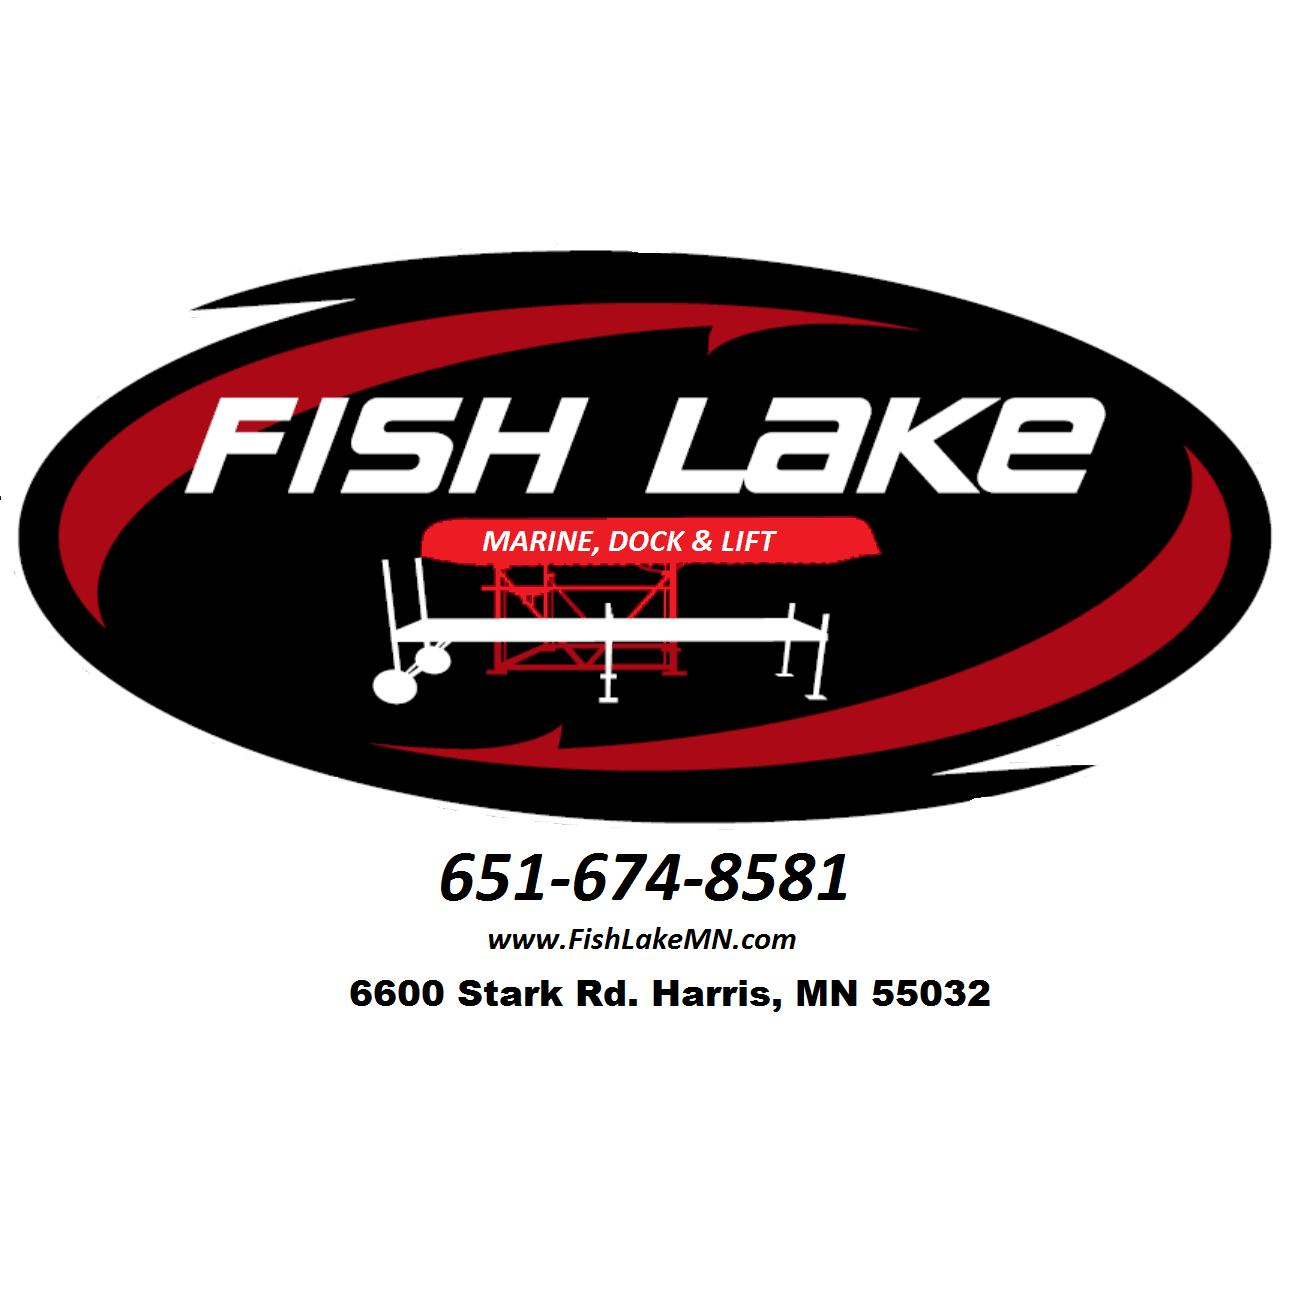 Fish Lake Dock & Lift